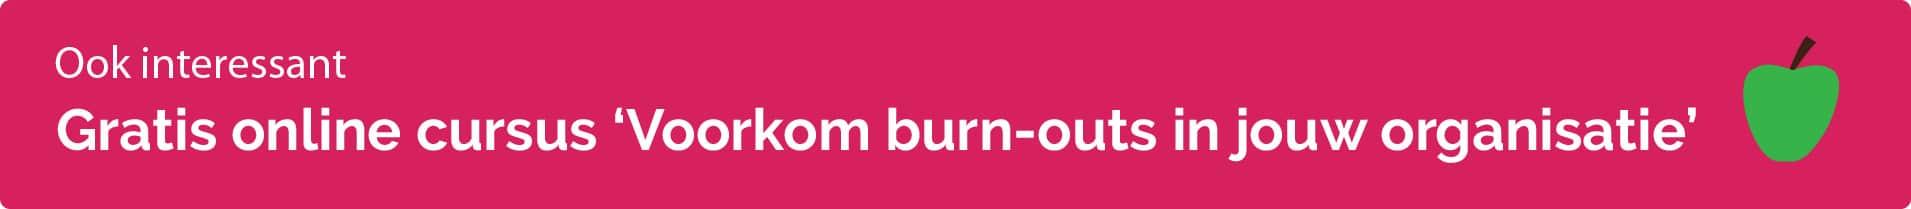 Volg de cursus burn-outpreventie